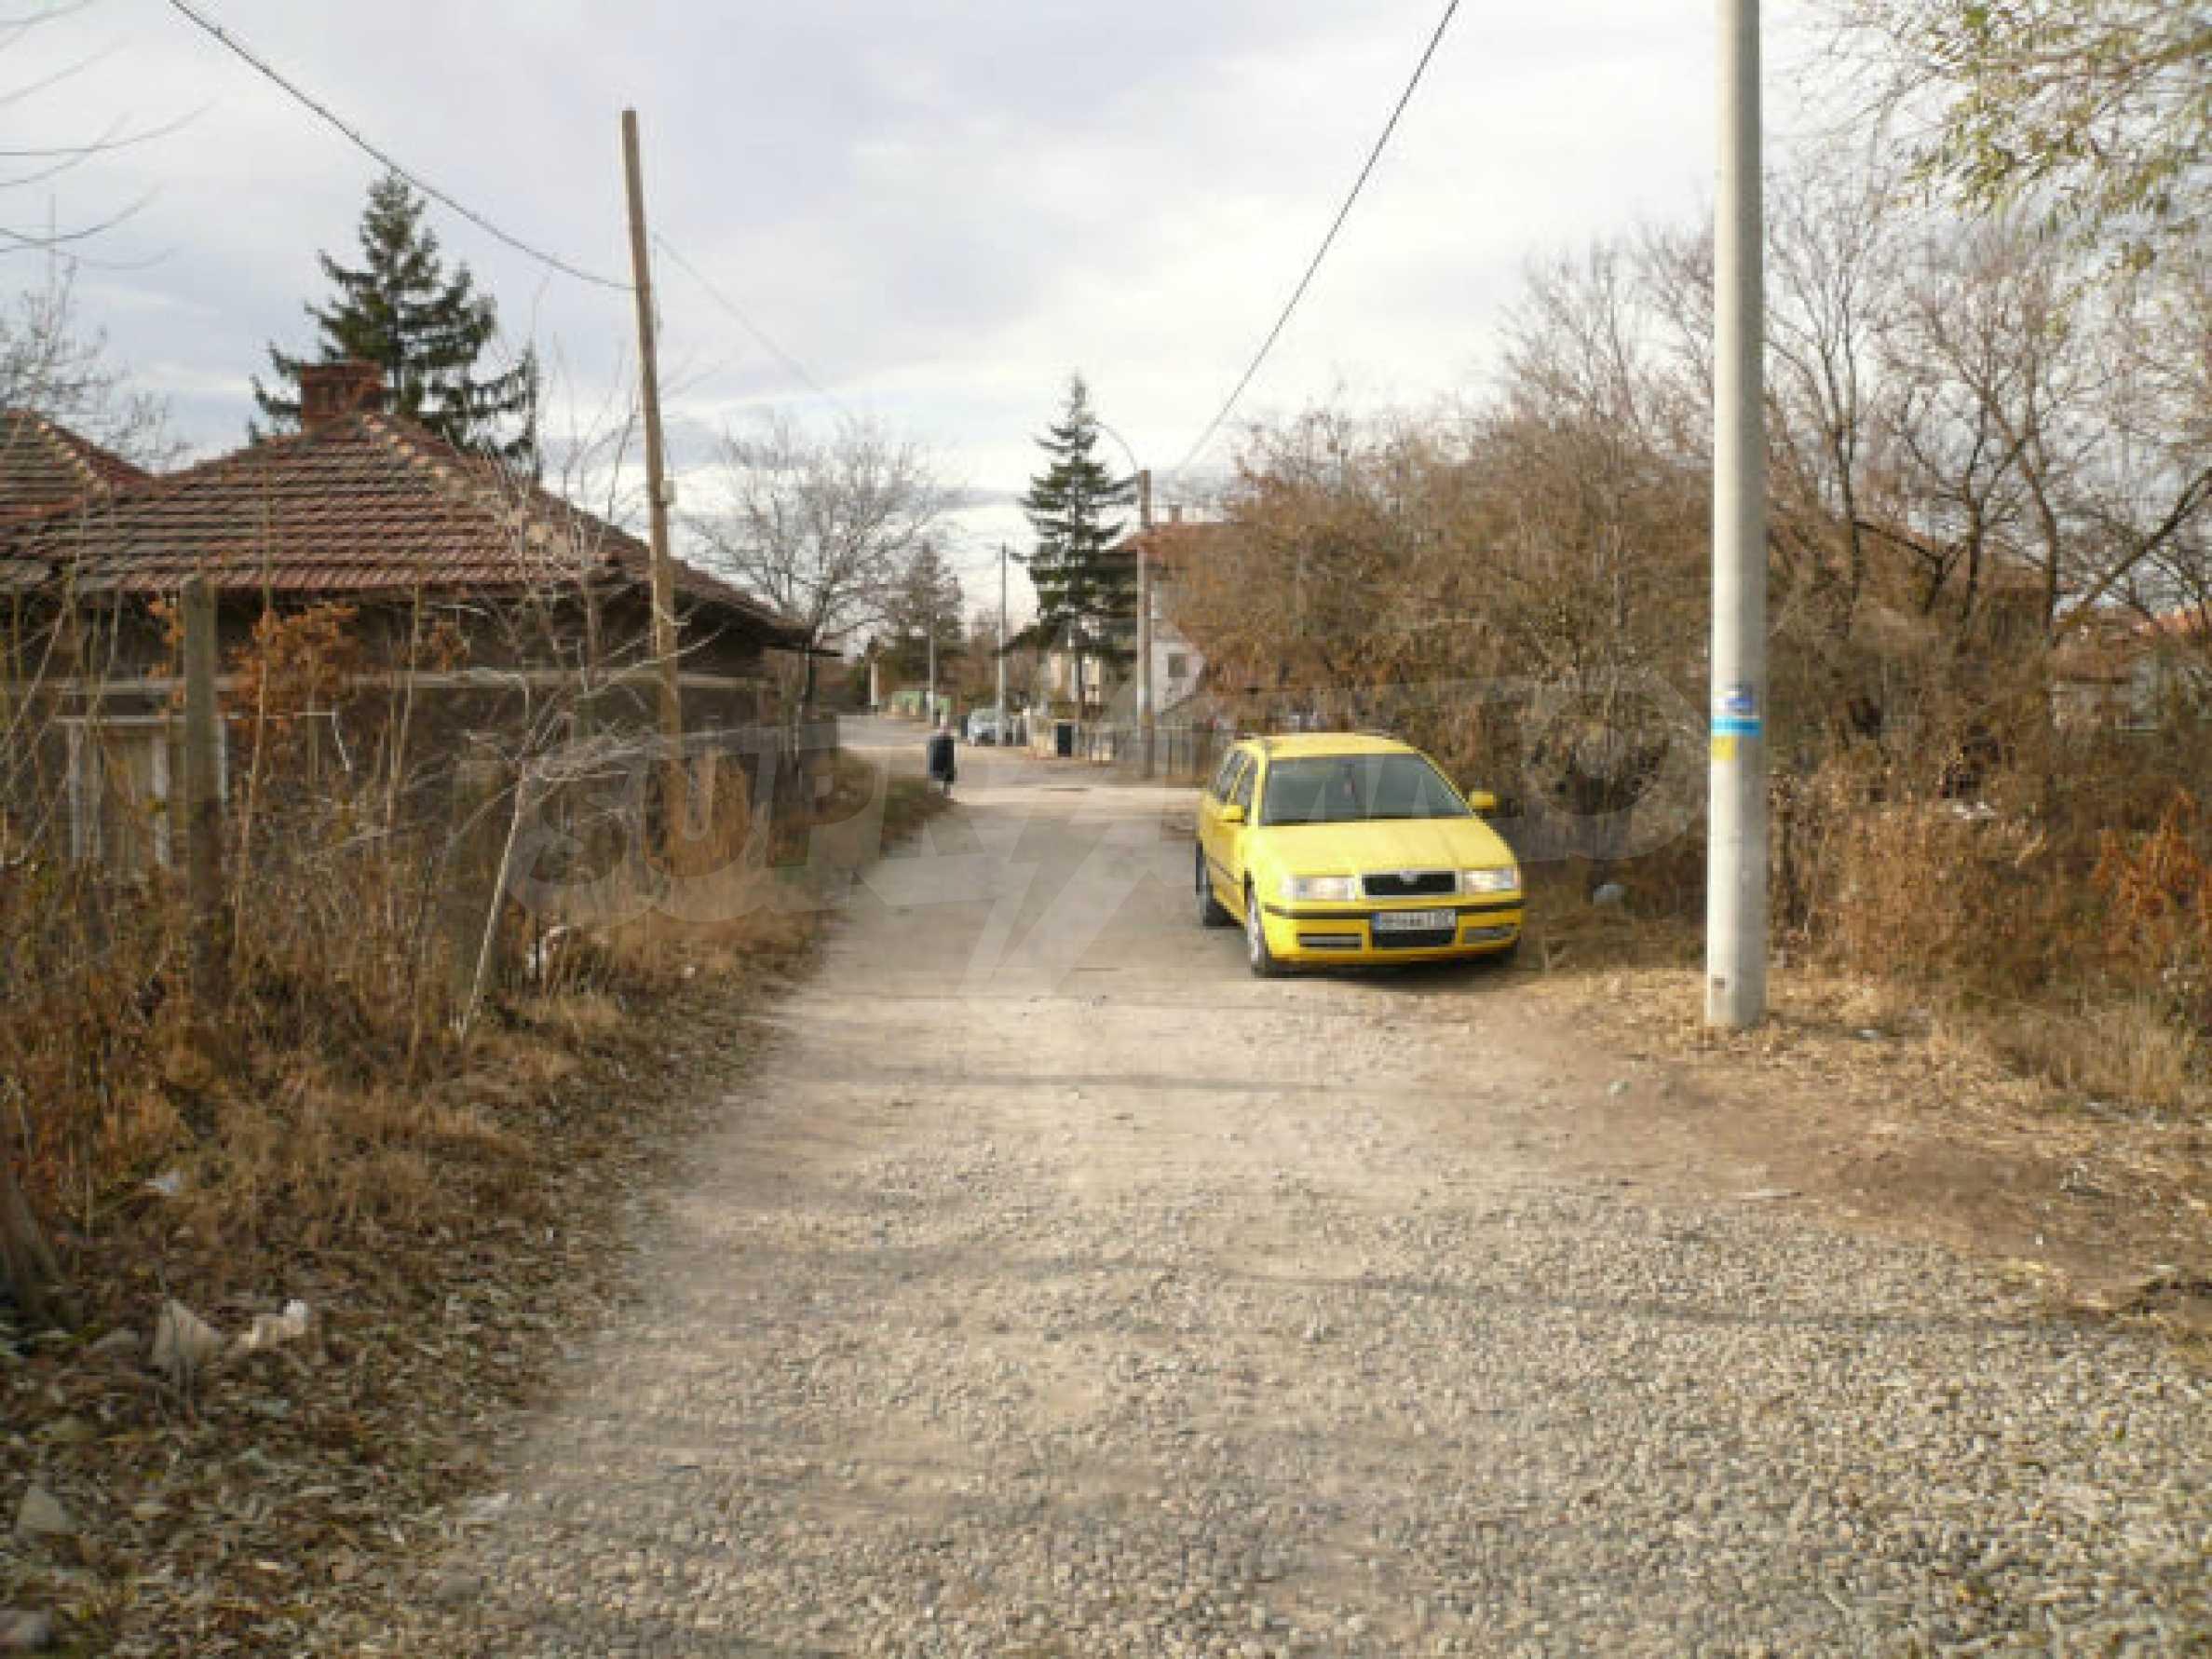 Участок под застройку дома в городе Видин 3